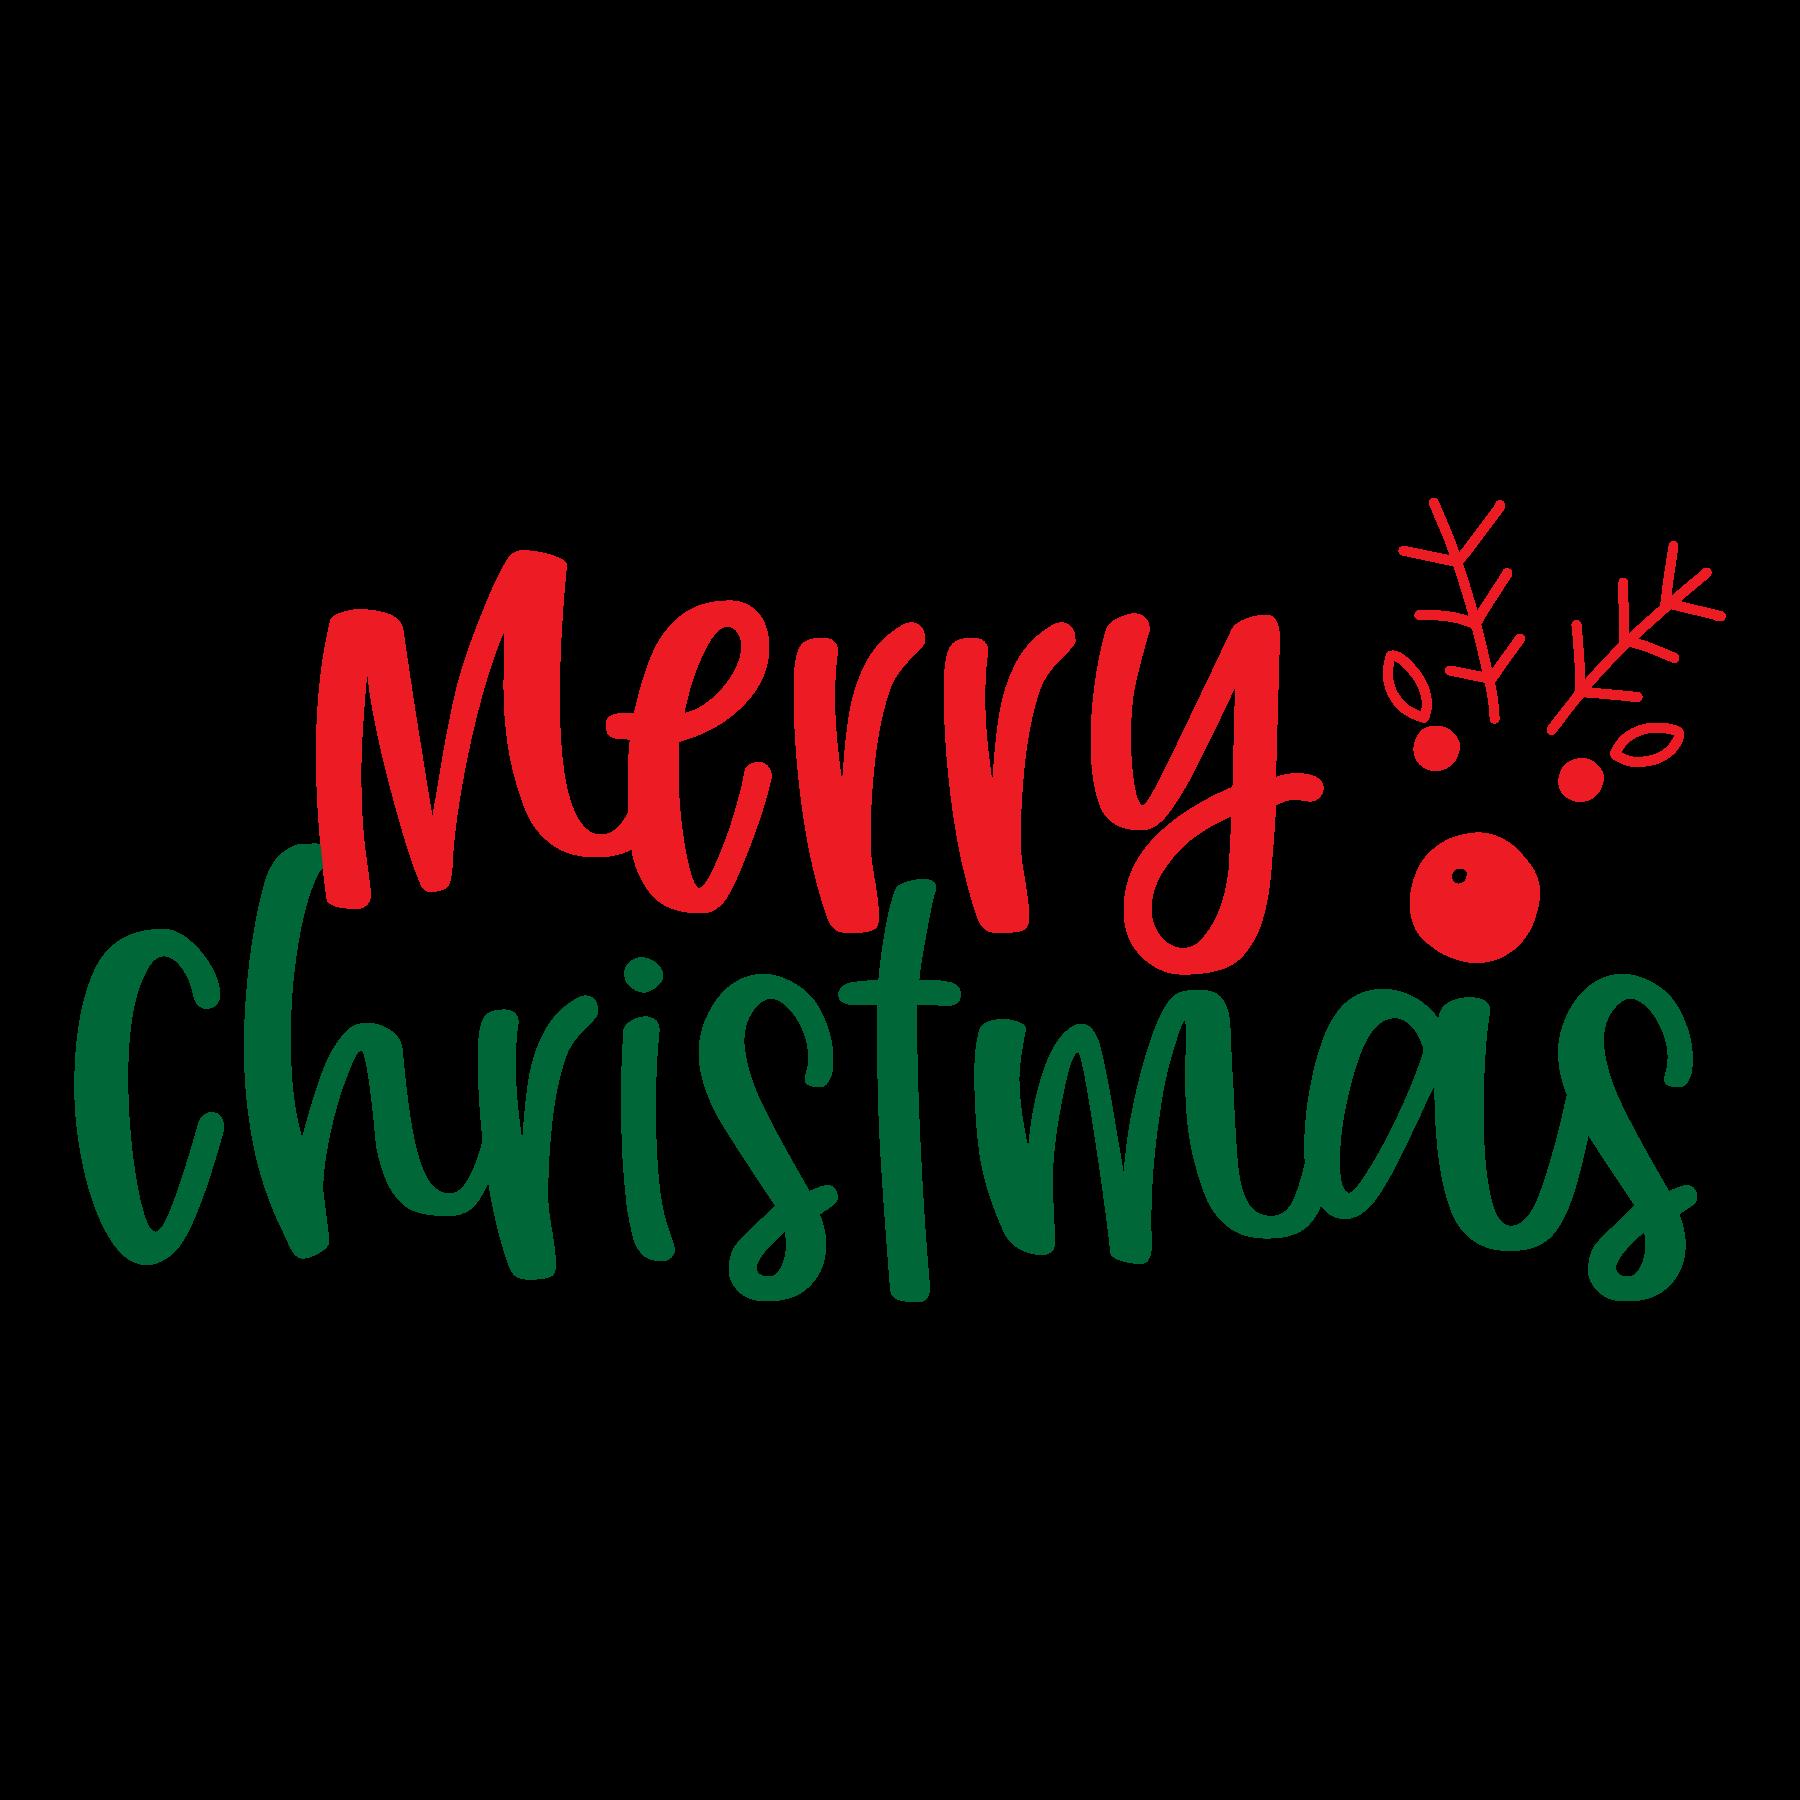 Merry Christmas SVG Cut Files